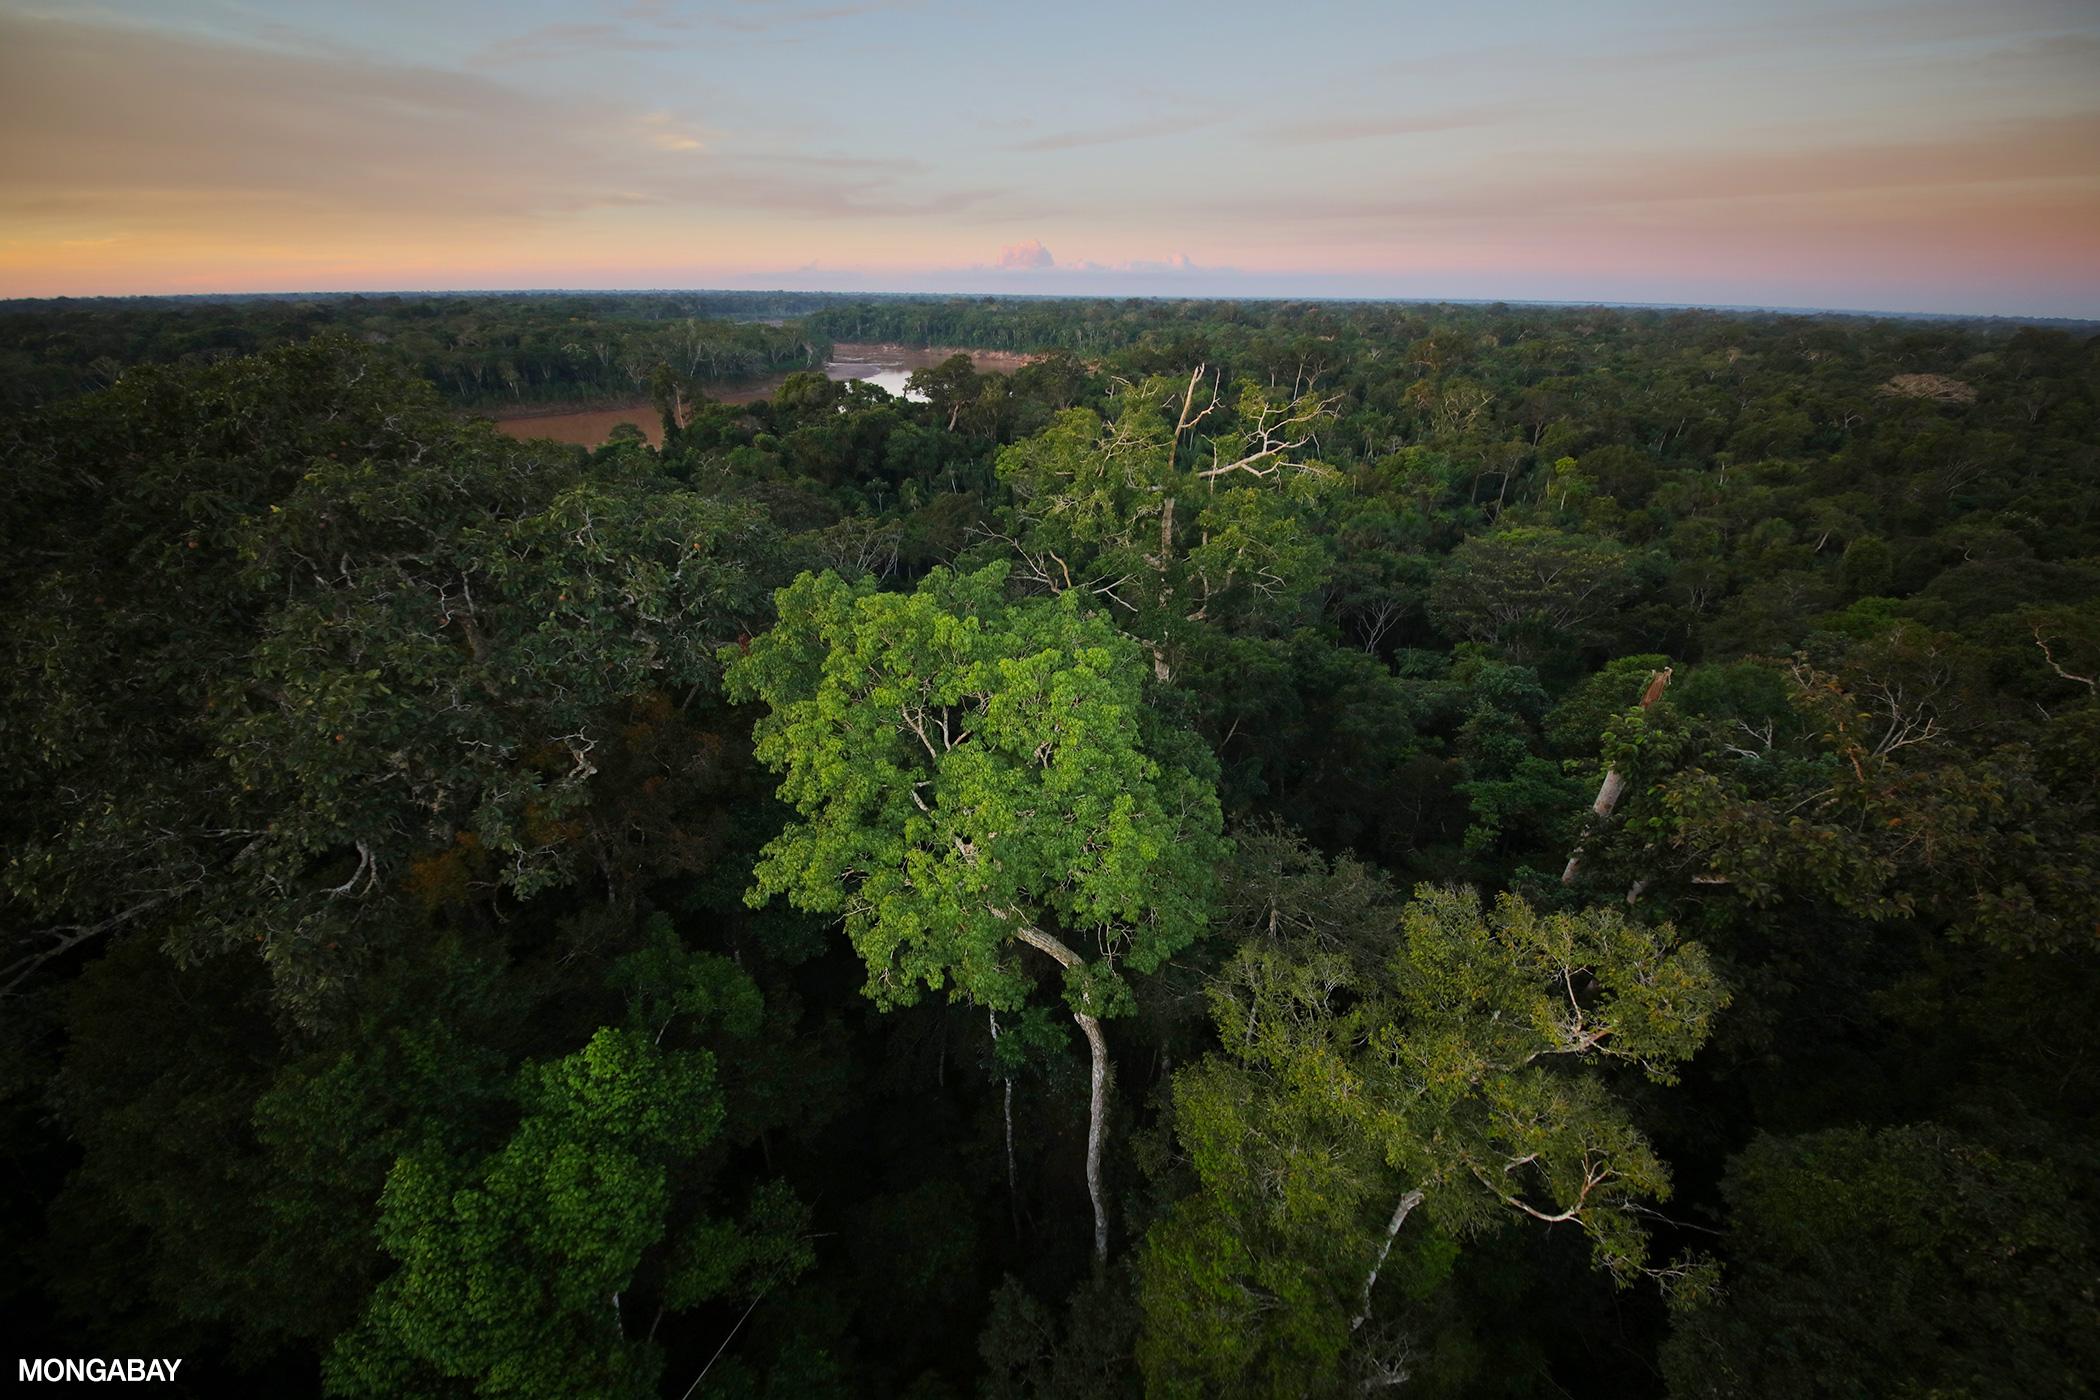 The Amazon Rainforest: The World's Largest Rainforest